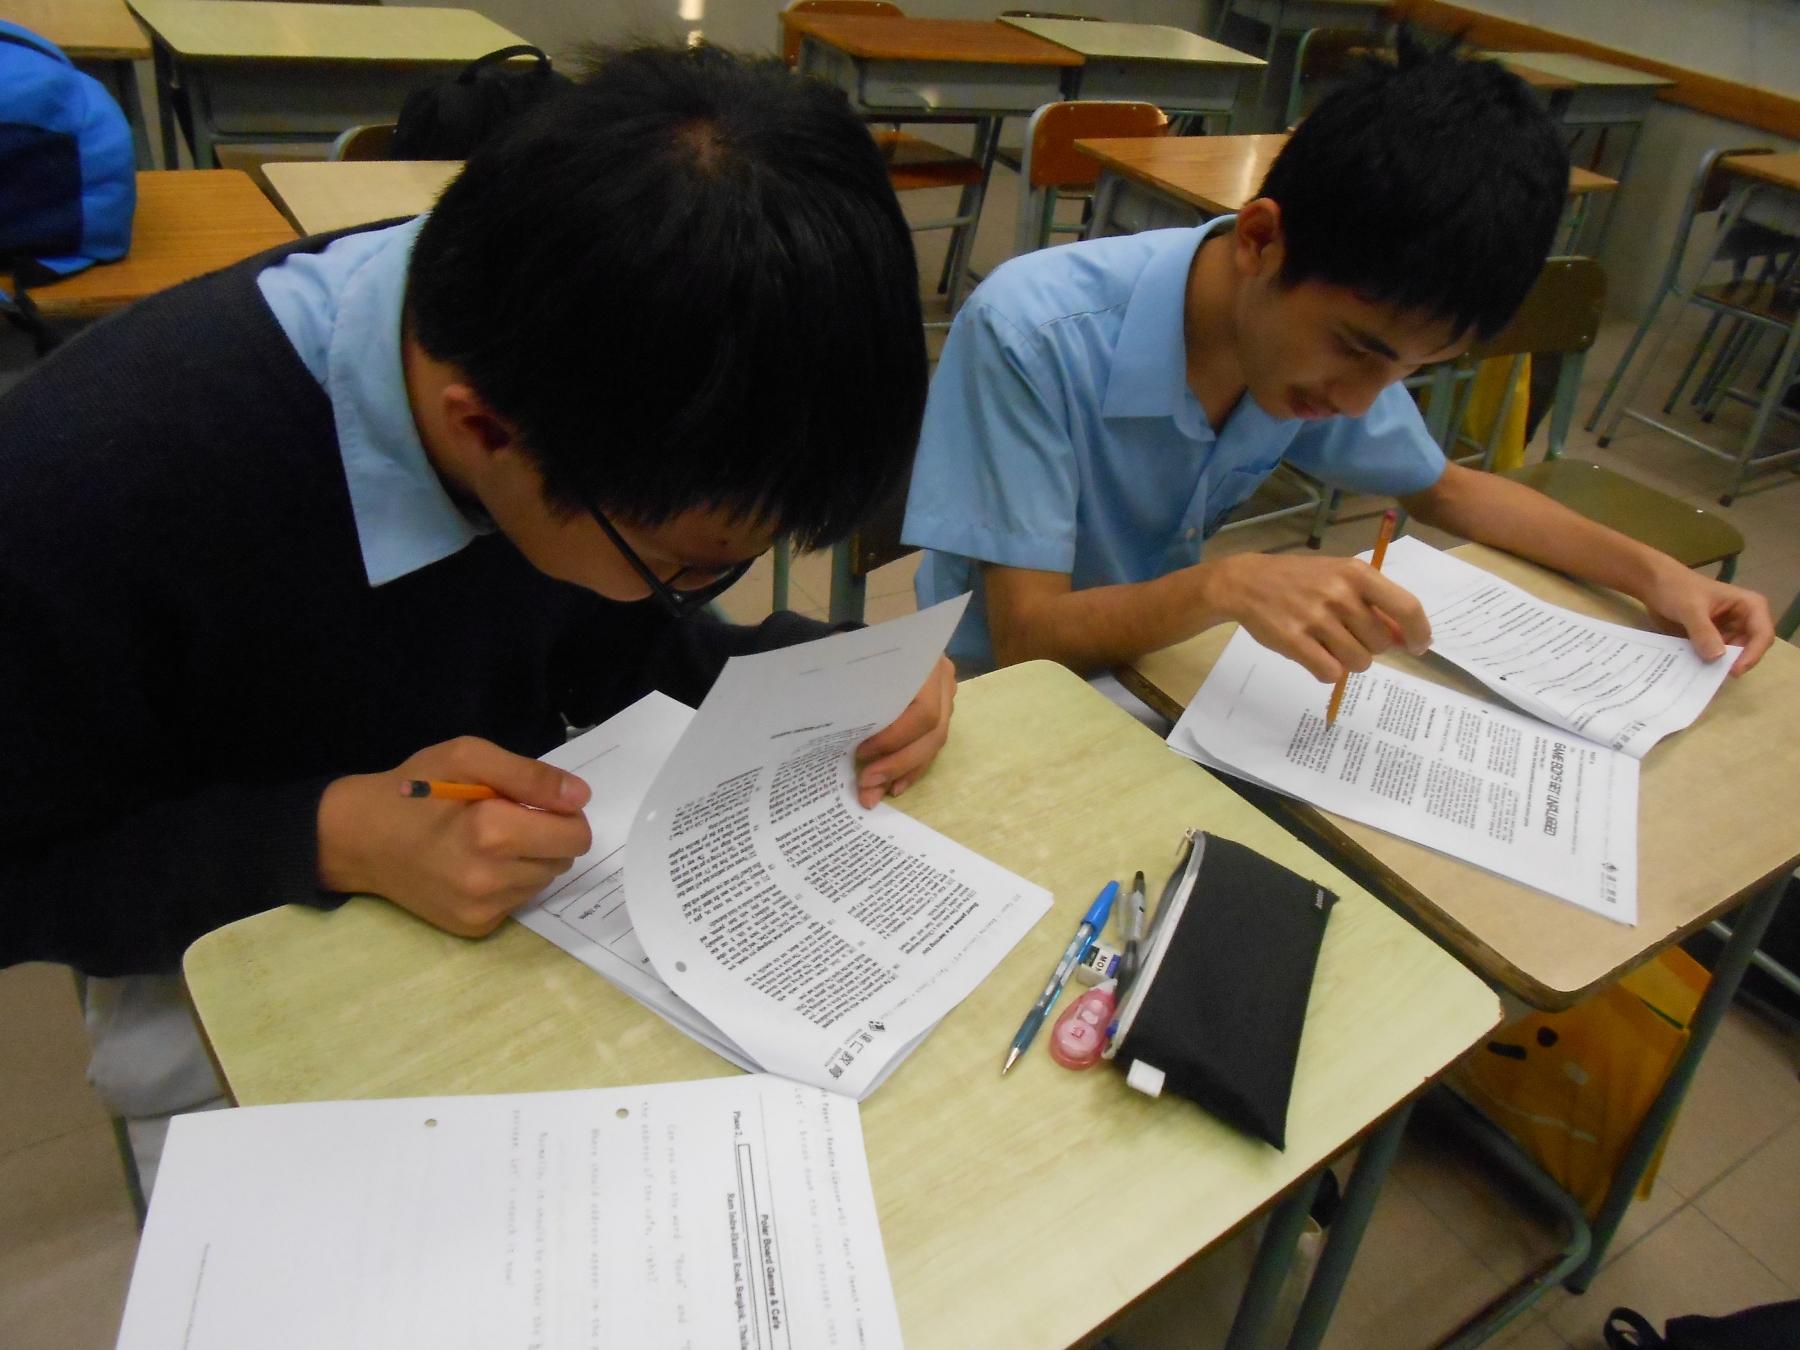 http://npc.edu.hk/sites/default/files/dscn8905.jpg